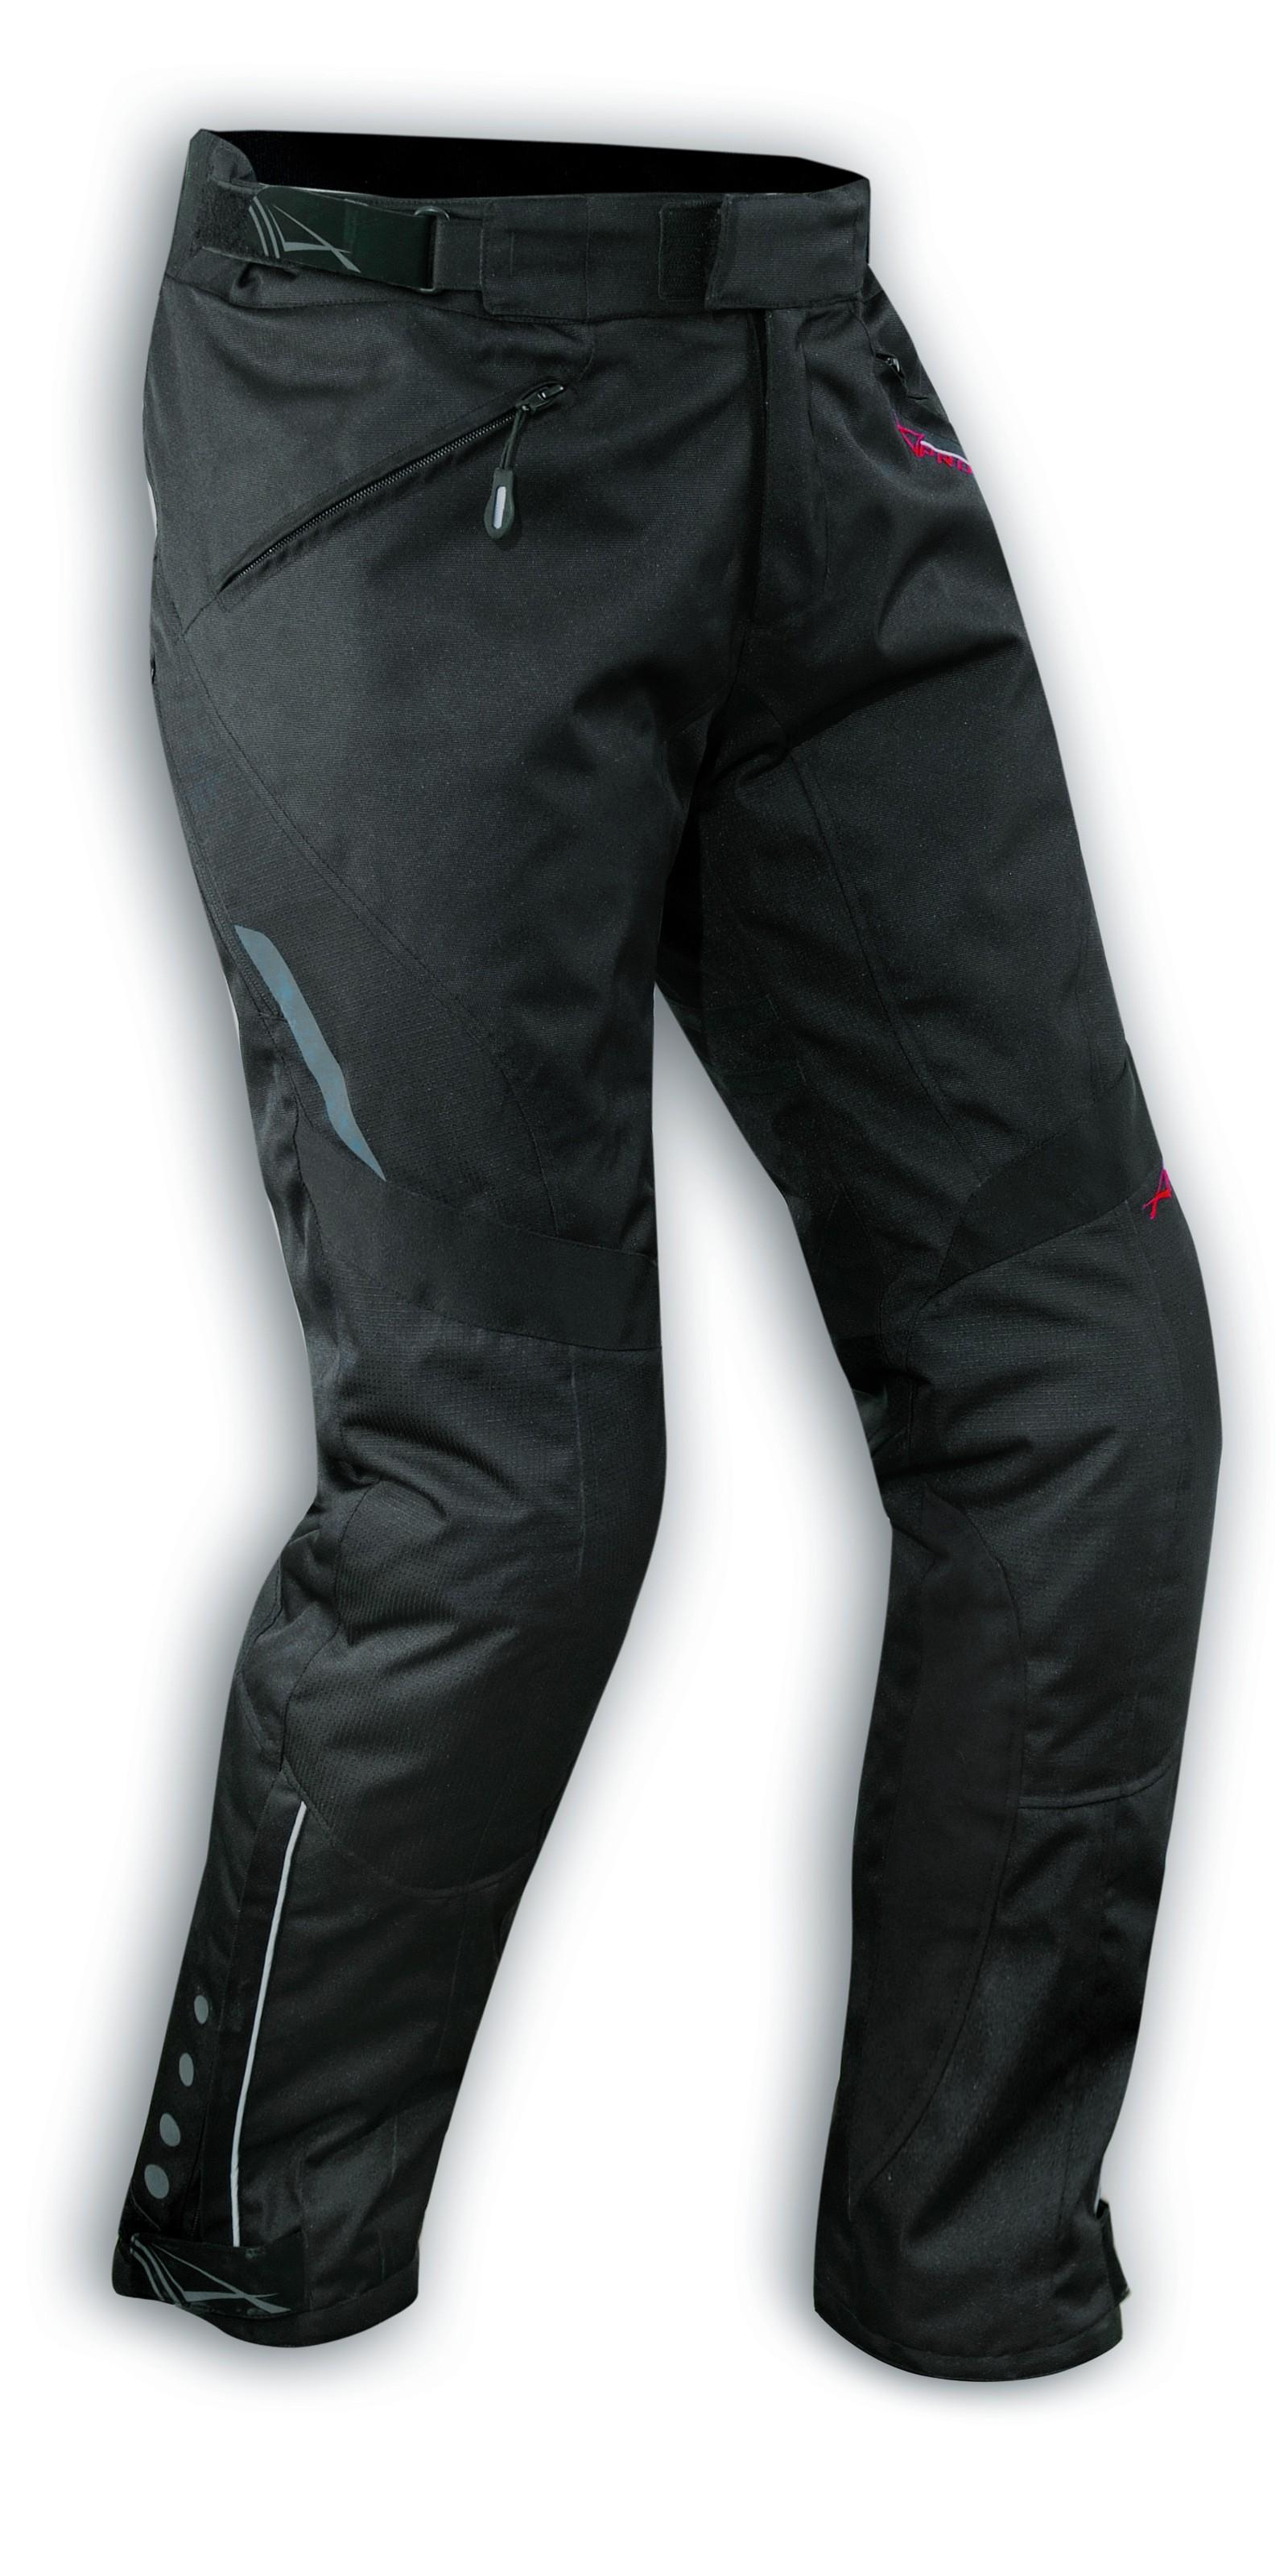 Pantaloni Impermeabile Moto Imbottitura Termica Estraibile Cordura Conformato